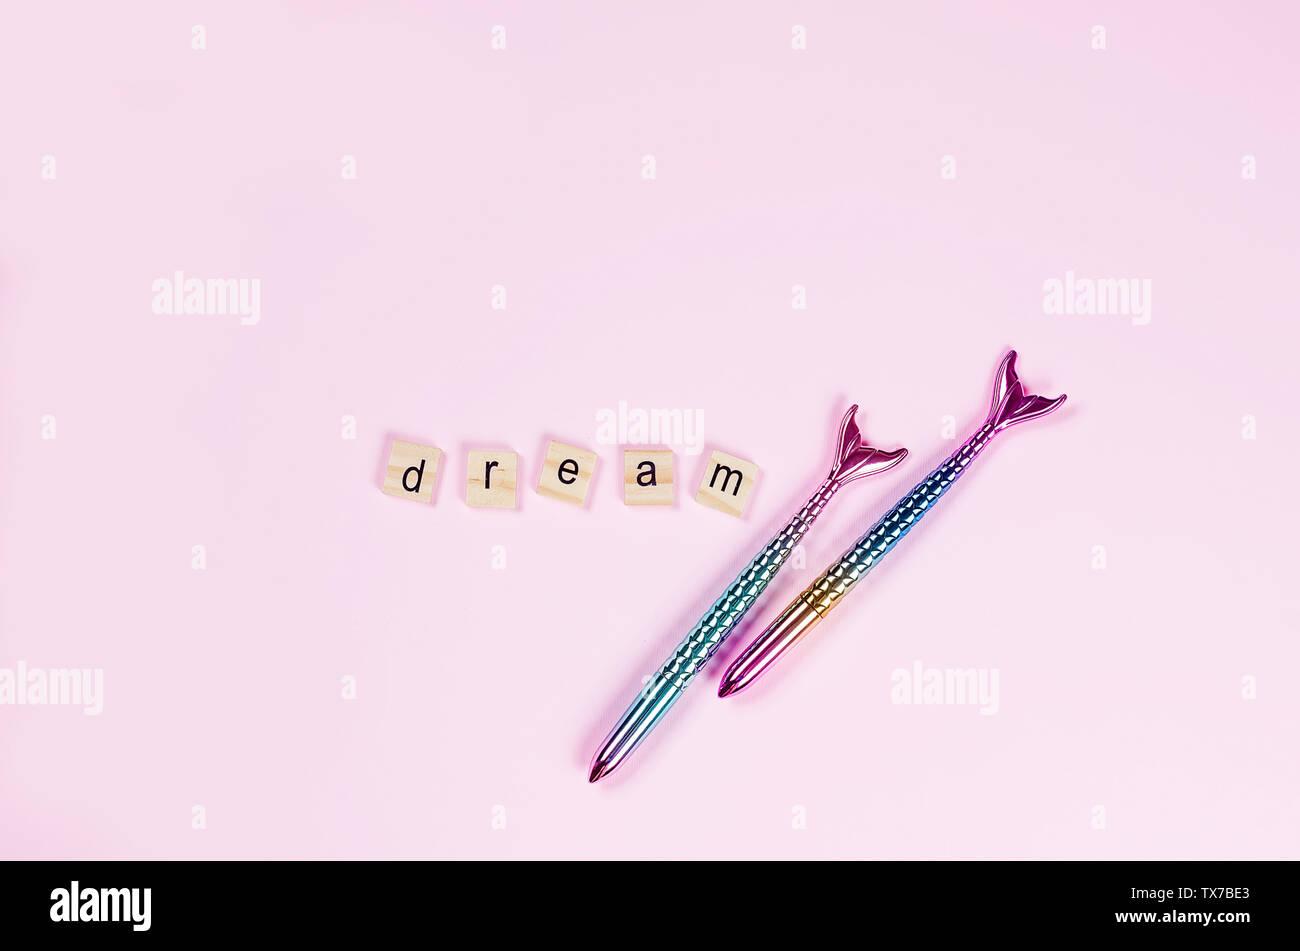 Dreaming Mermaid Stock Photos Dreaming Mermaid Stock Images Alamy